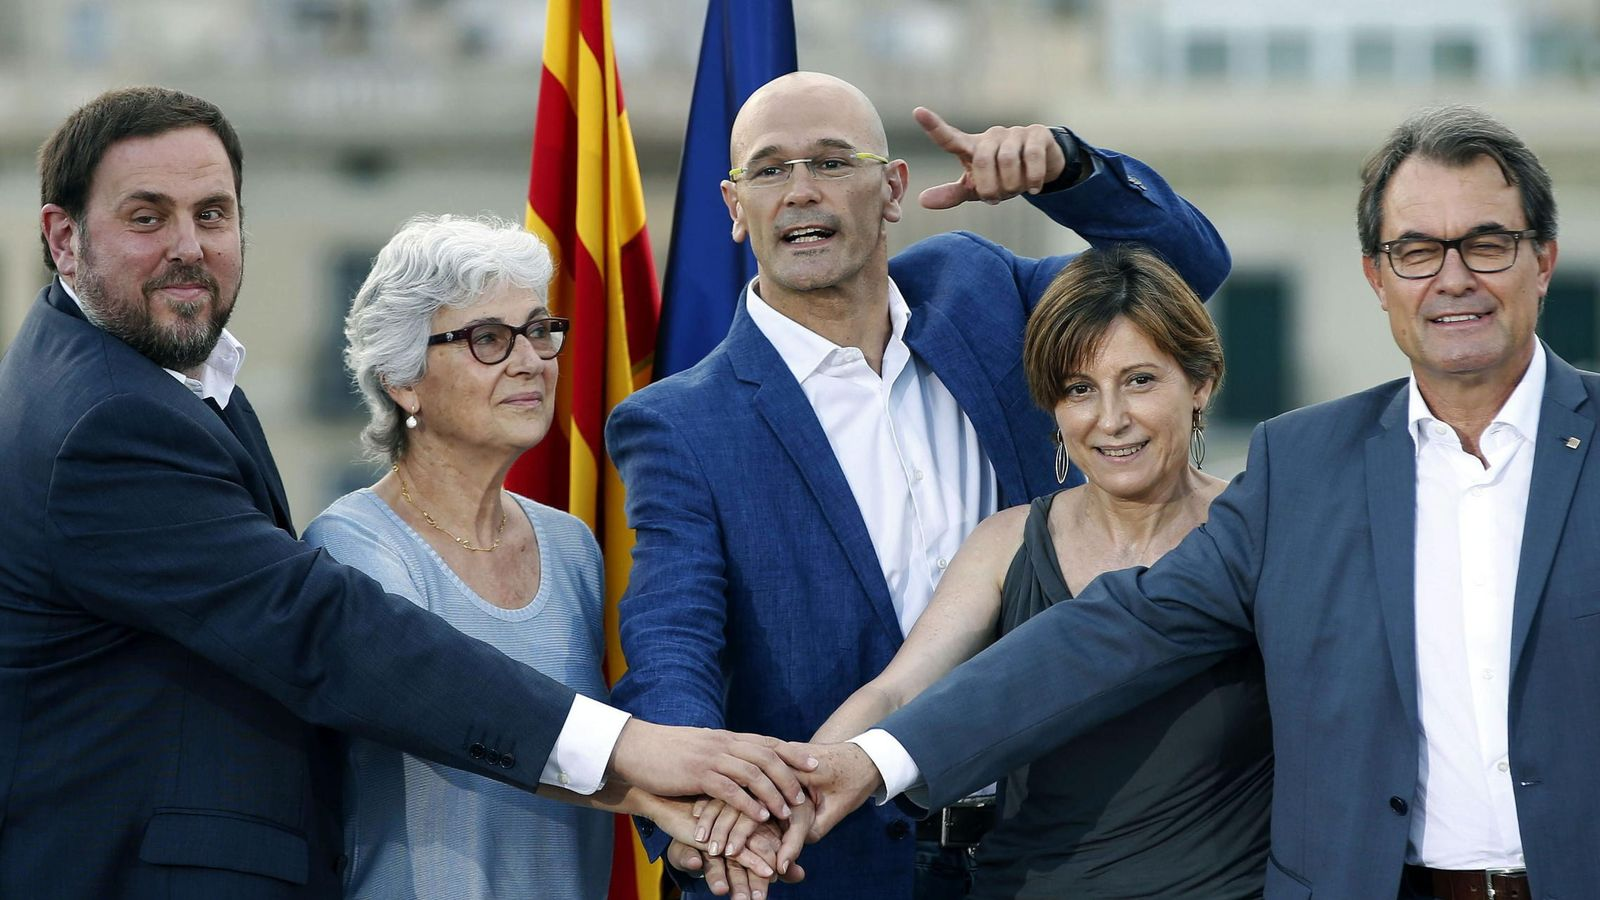 Foto: El presidente de la Generalitat y de CDC, Artur Mas (d), el presidente de ERC, Oriol Junqueras (i), el cabeza de lista, Raül Romeva (c), la número dos, Carme Forcadell (2d), y la número tres, Muriel Casals (Efe)